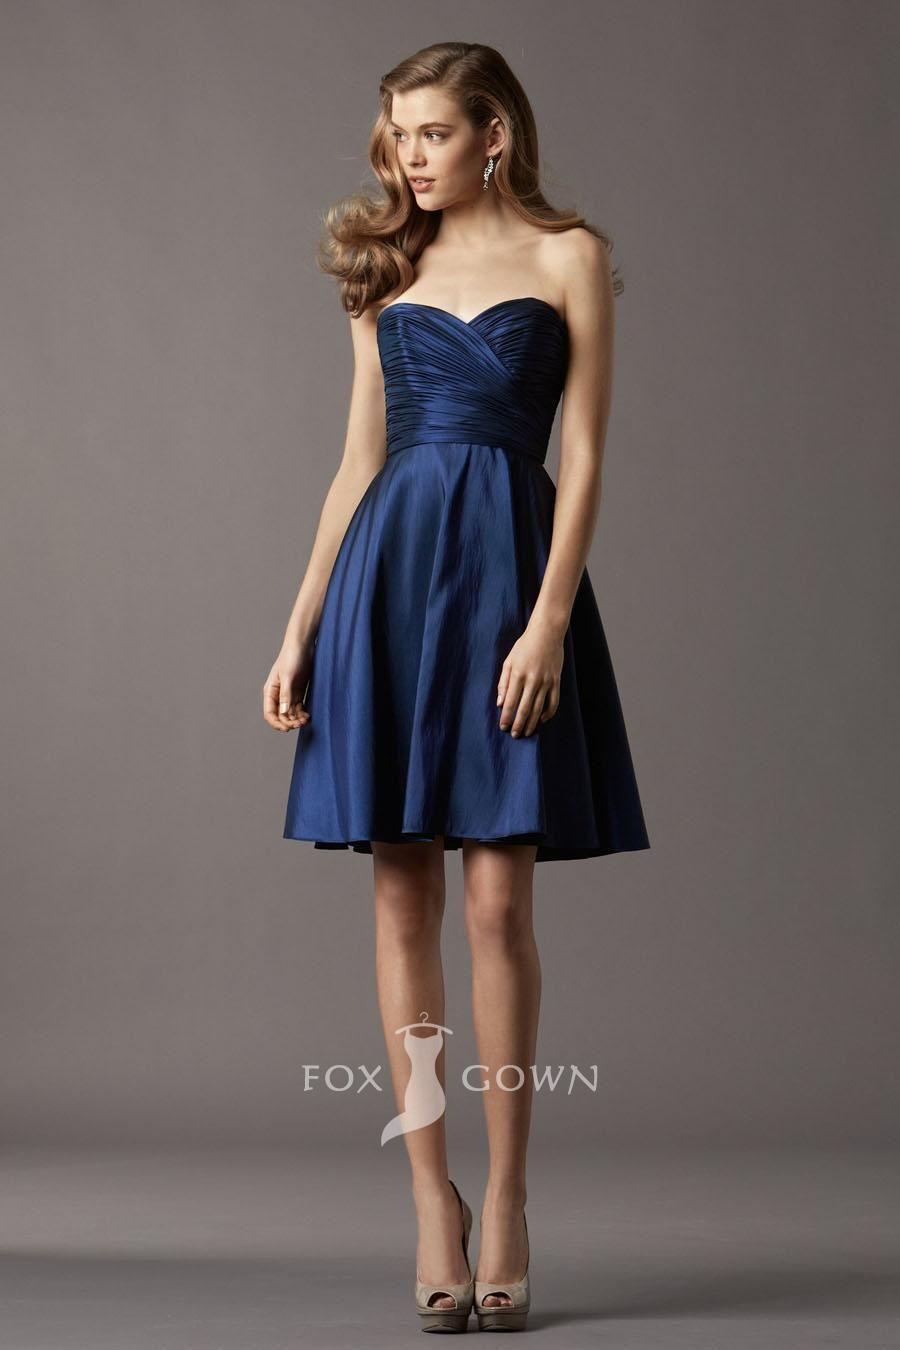 78 Best images about dresses on Pinterest  Summer wedding dresses ...